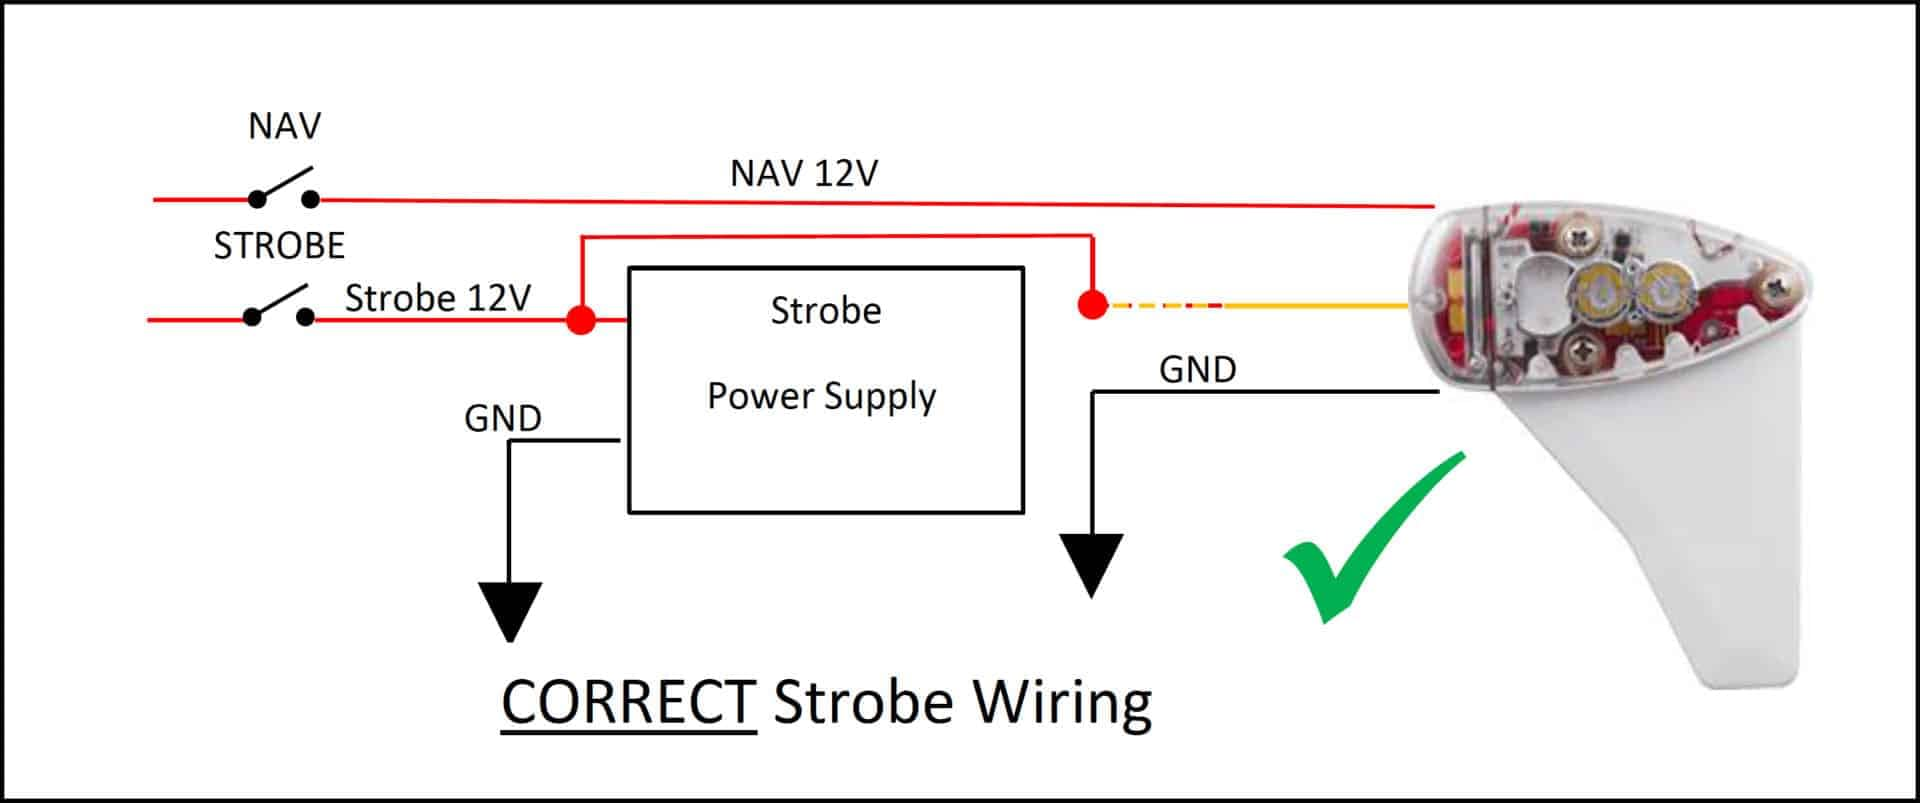 Strobe Wiring Diagram - uAvionix | Beacon Light Wiring Diagram |  | uAvionix